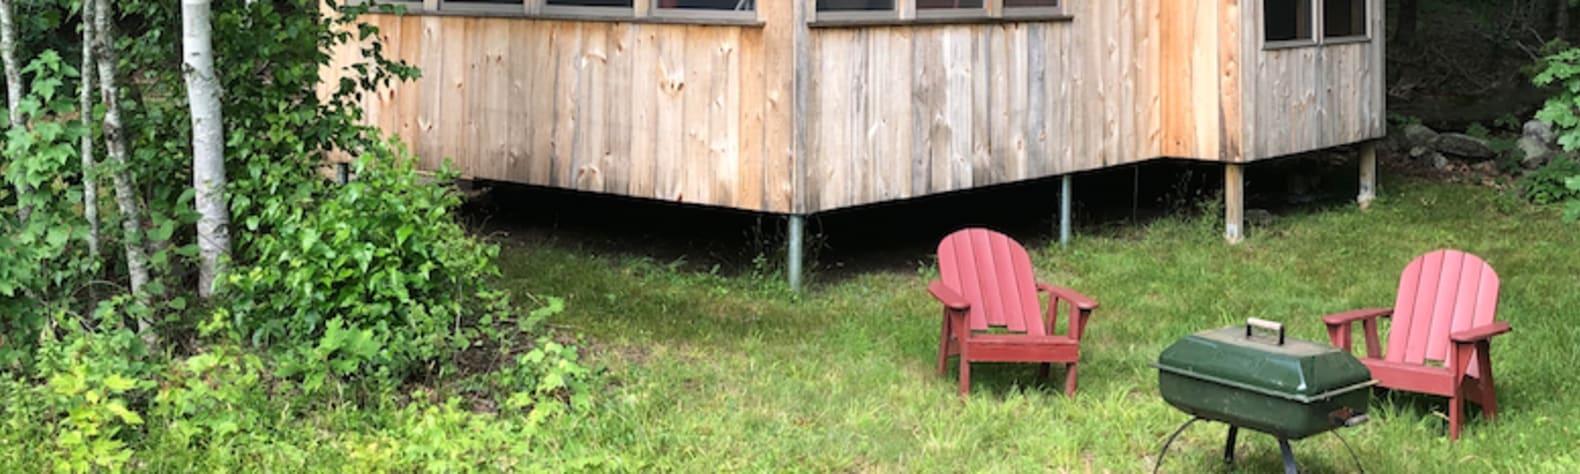 The cabin at White Duck Farm